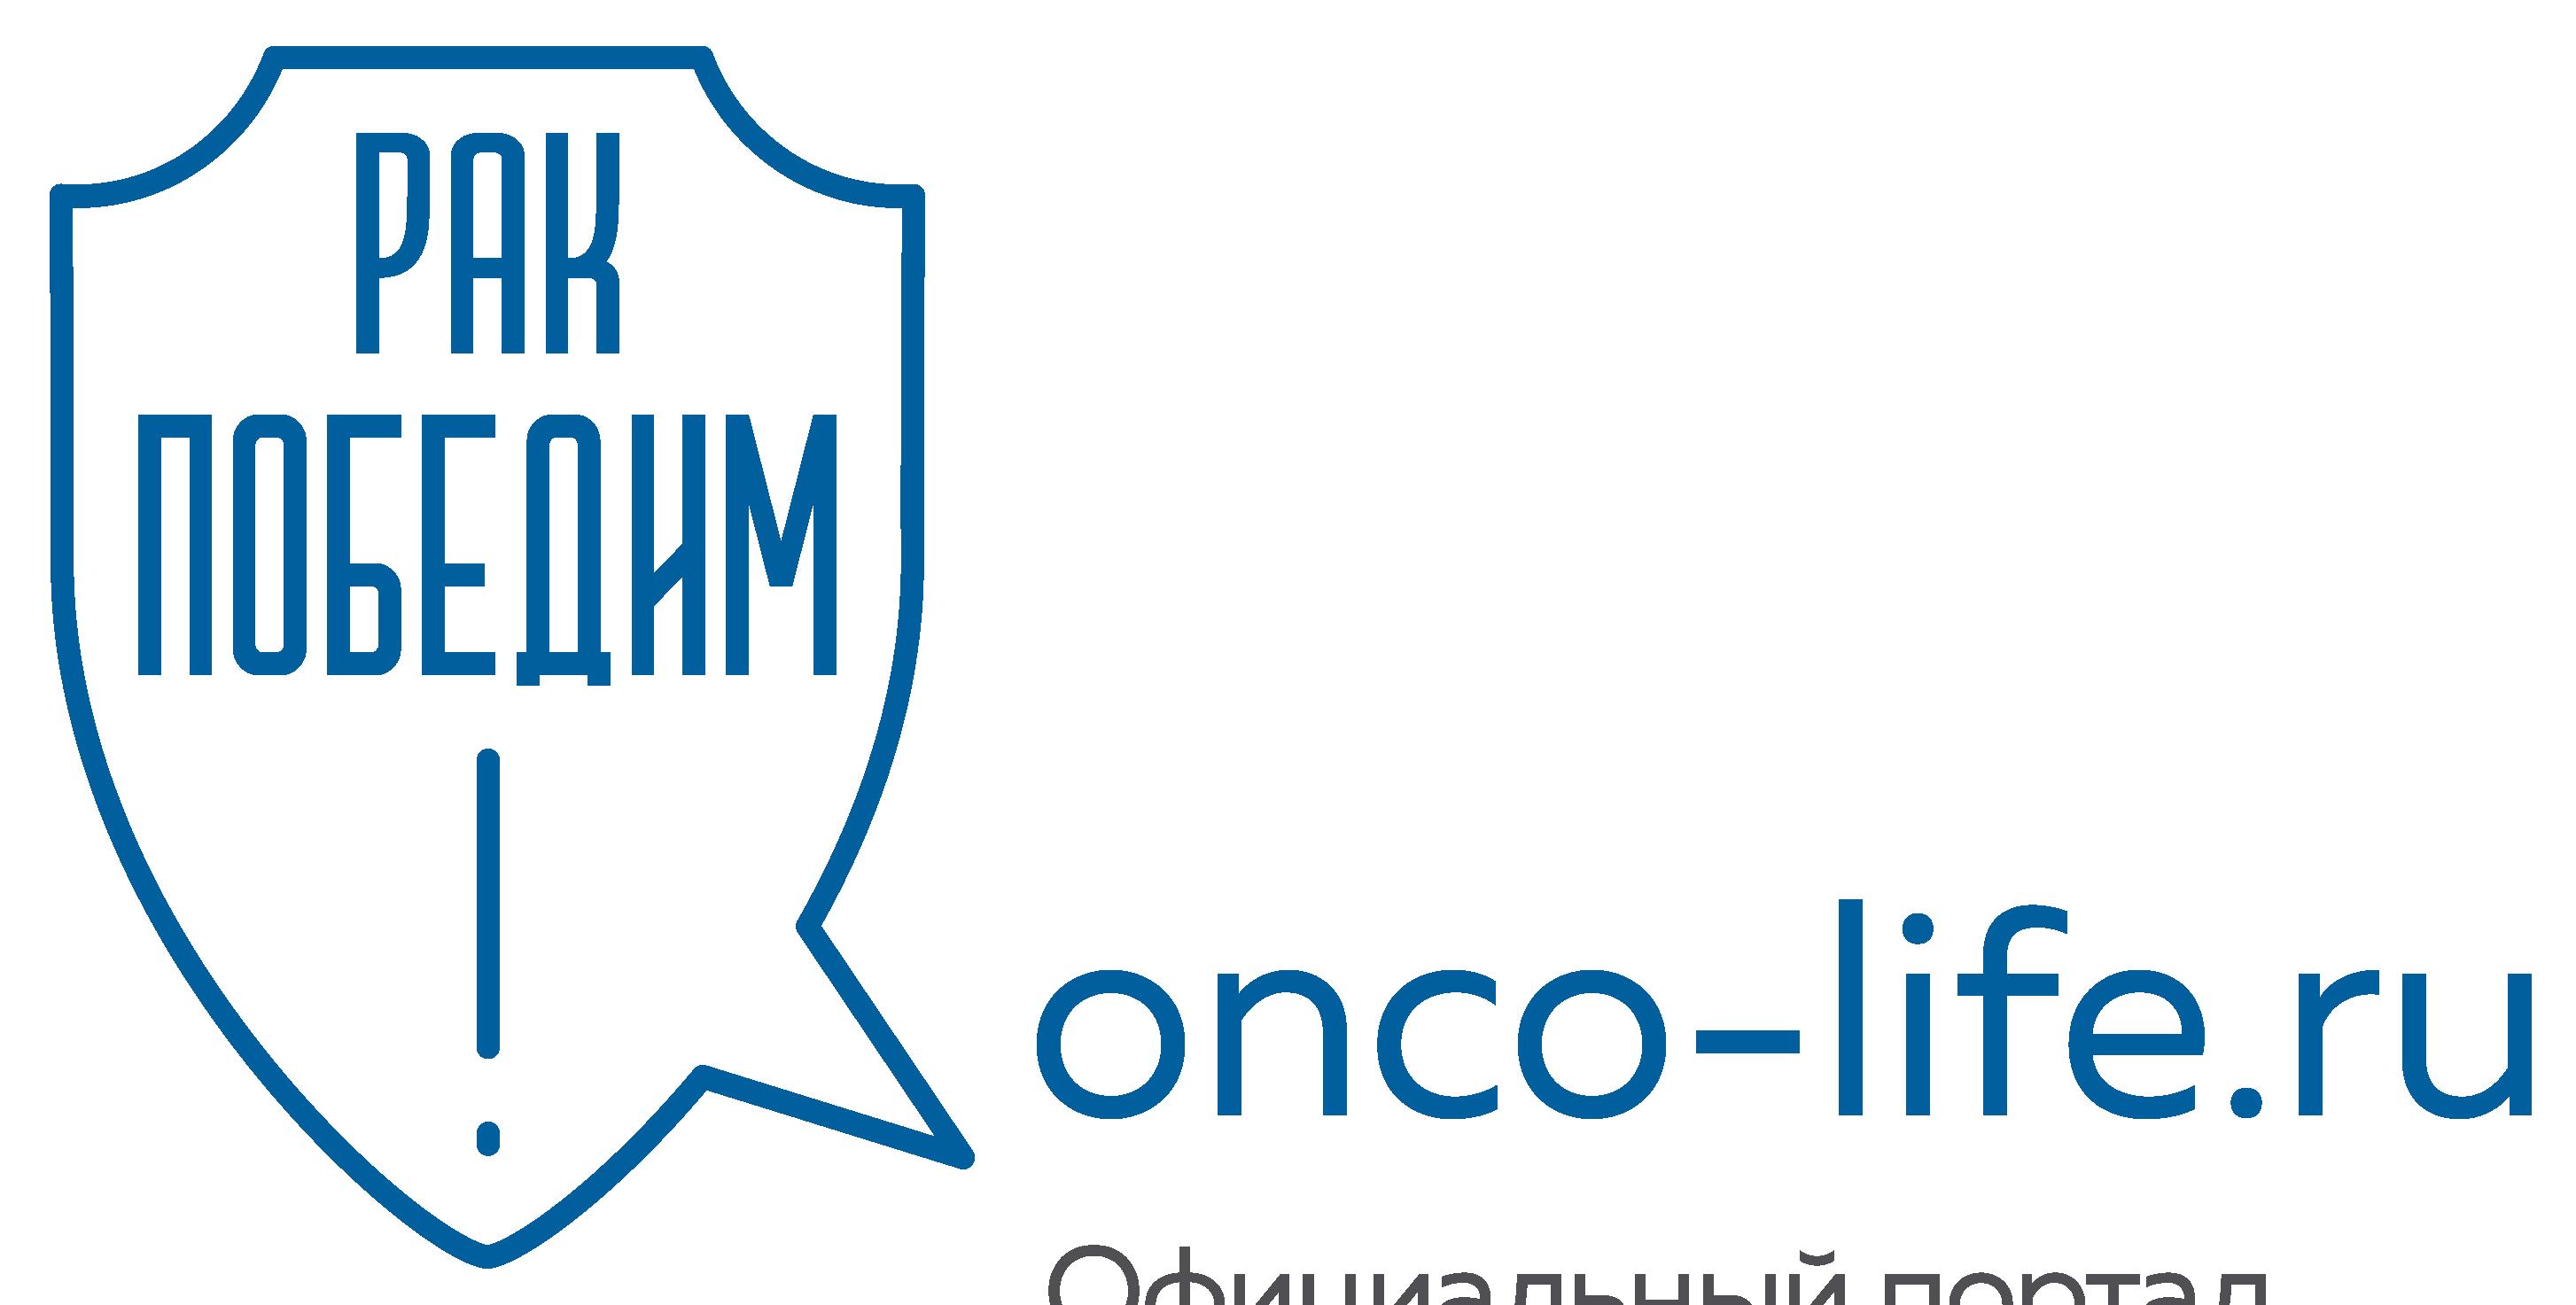 Onco-life